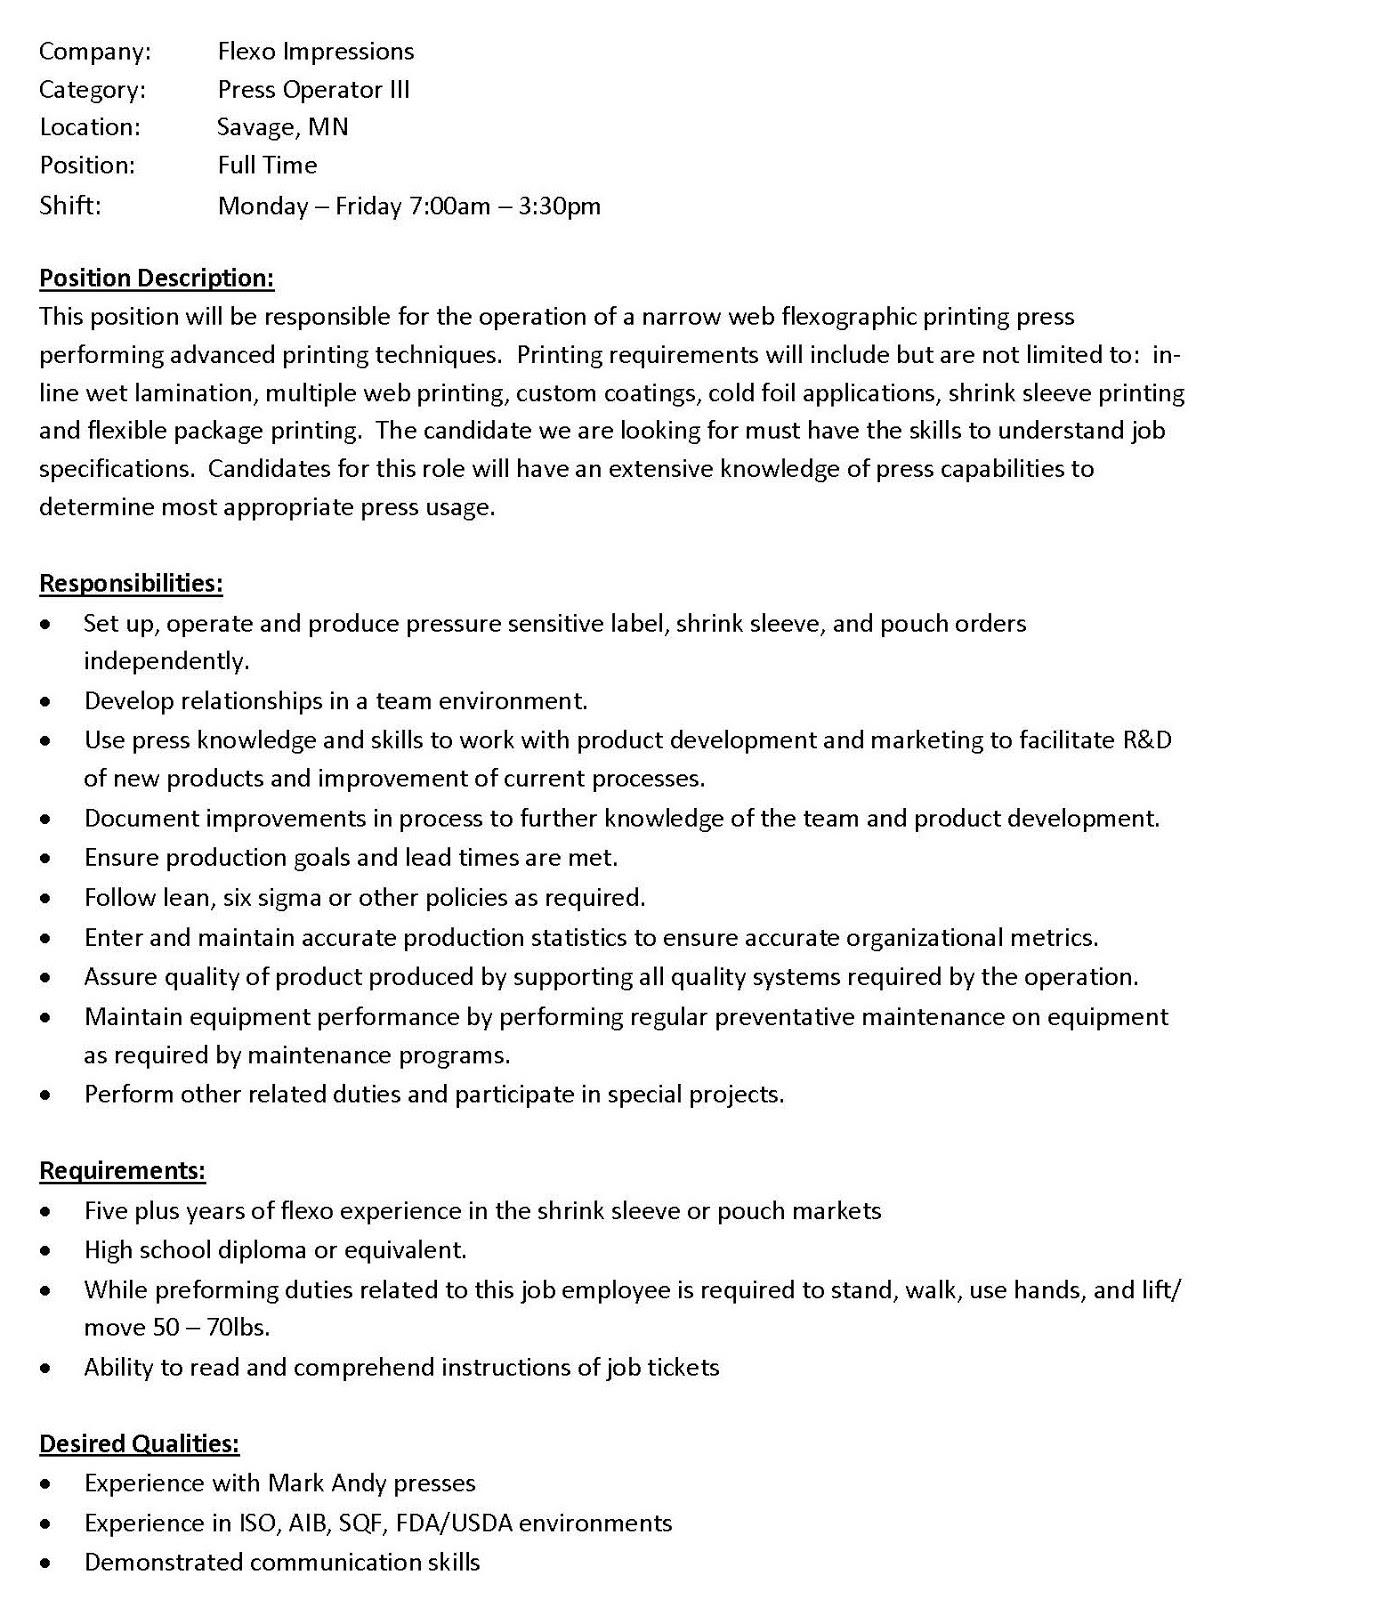 appointment setter resume appointment setter resume sample appointment setter resume examples appointment setter resume skills 2019 appointment setter resume cover letter appointment setter job description resume 2020 appointment setter duties for resume